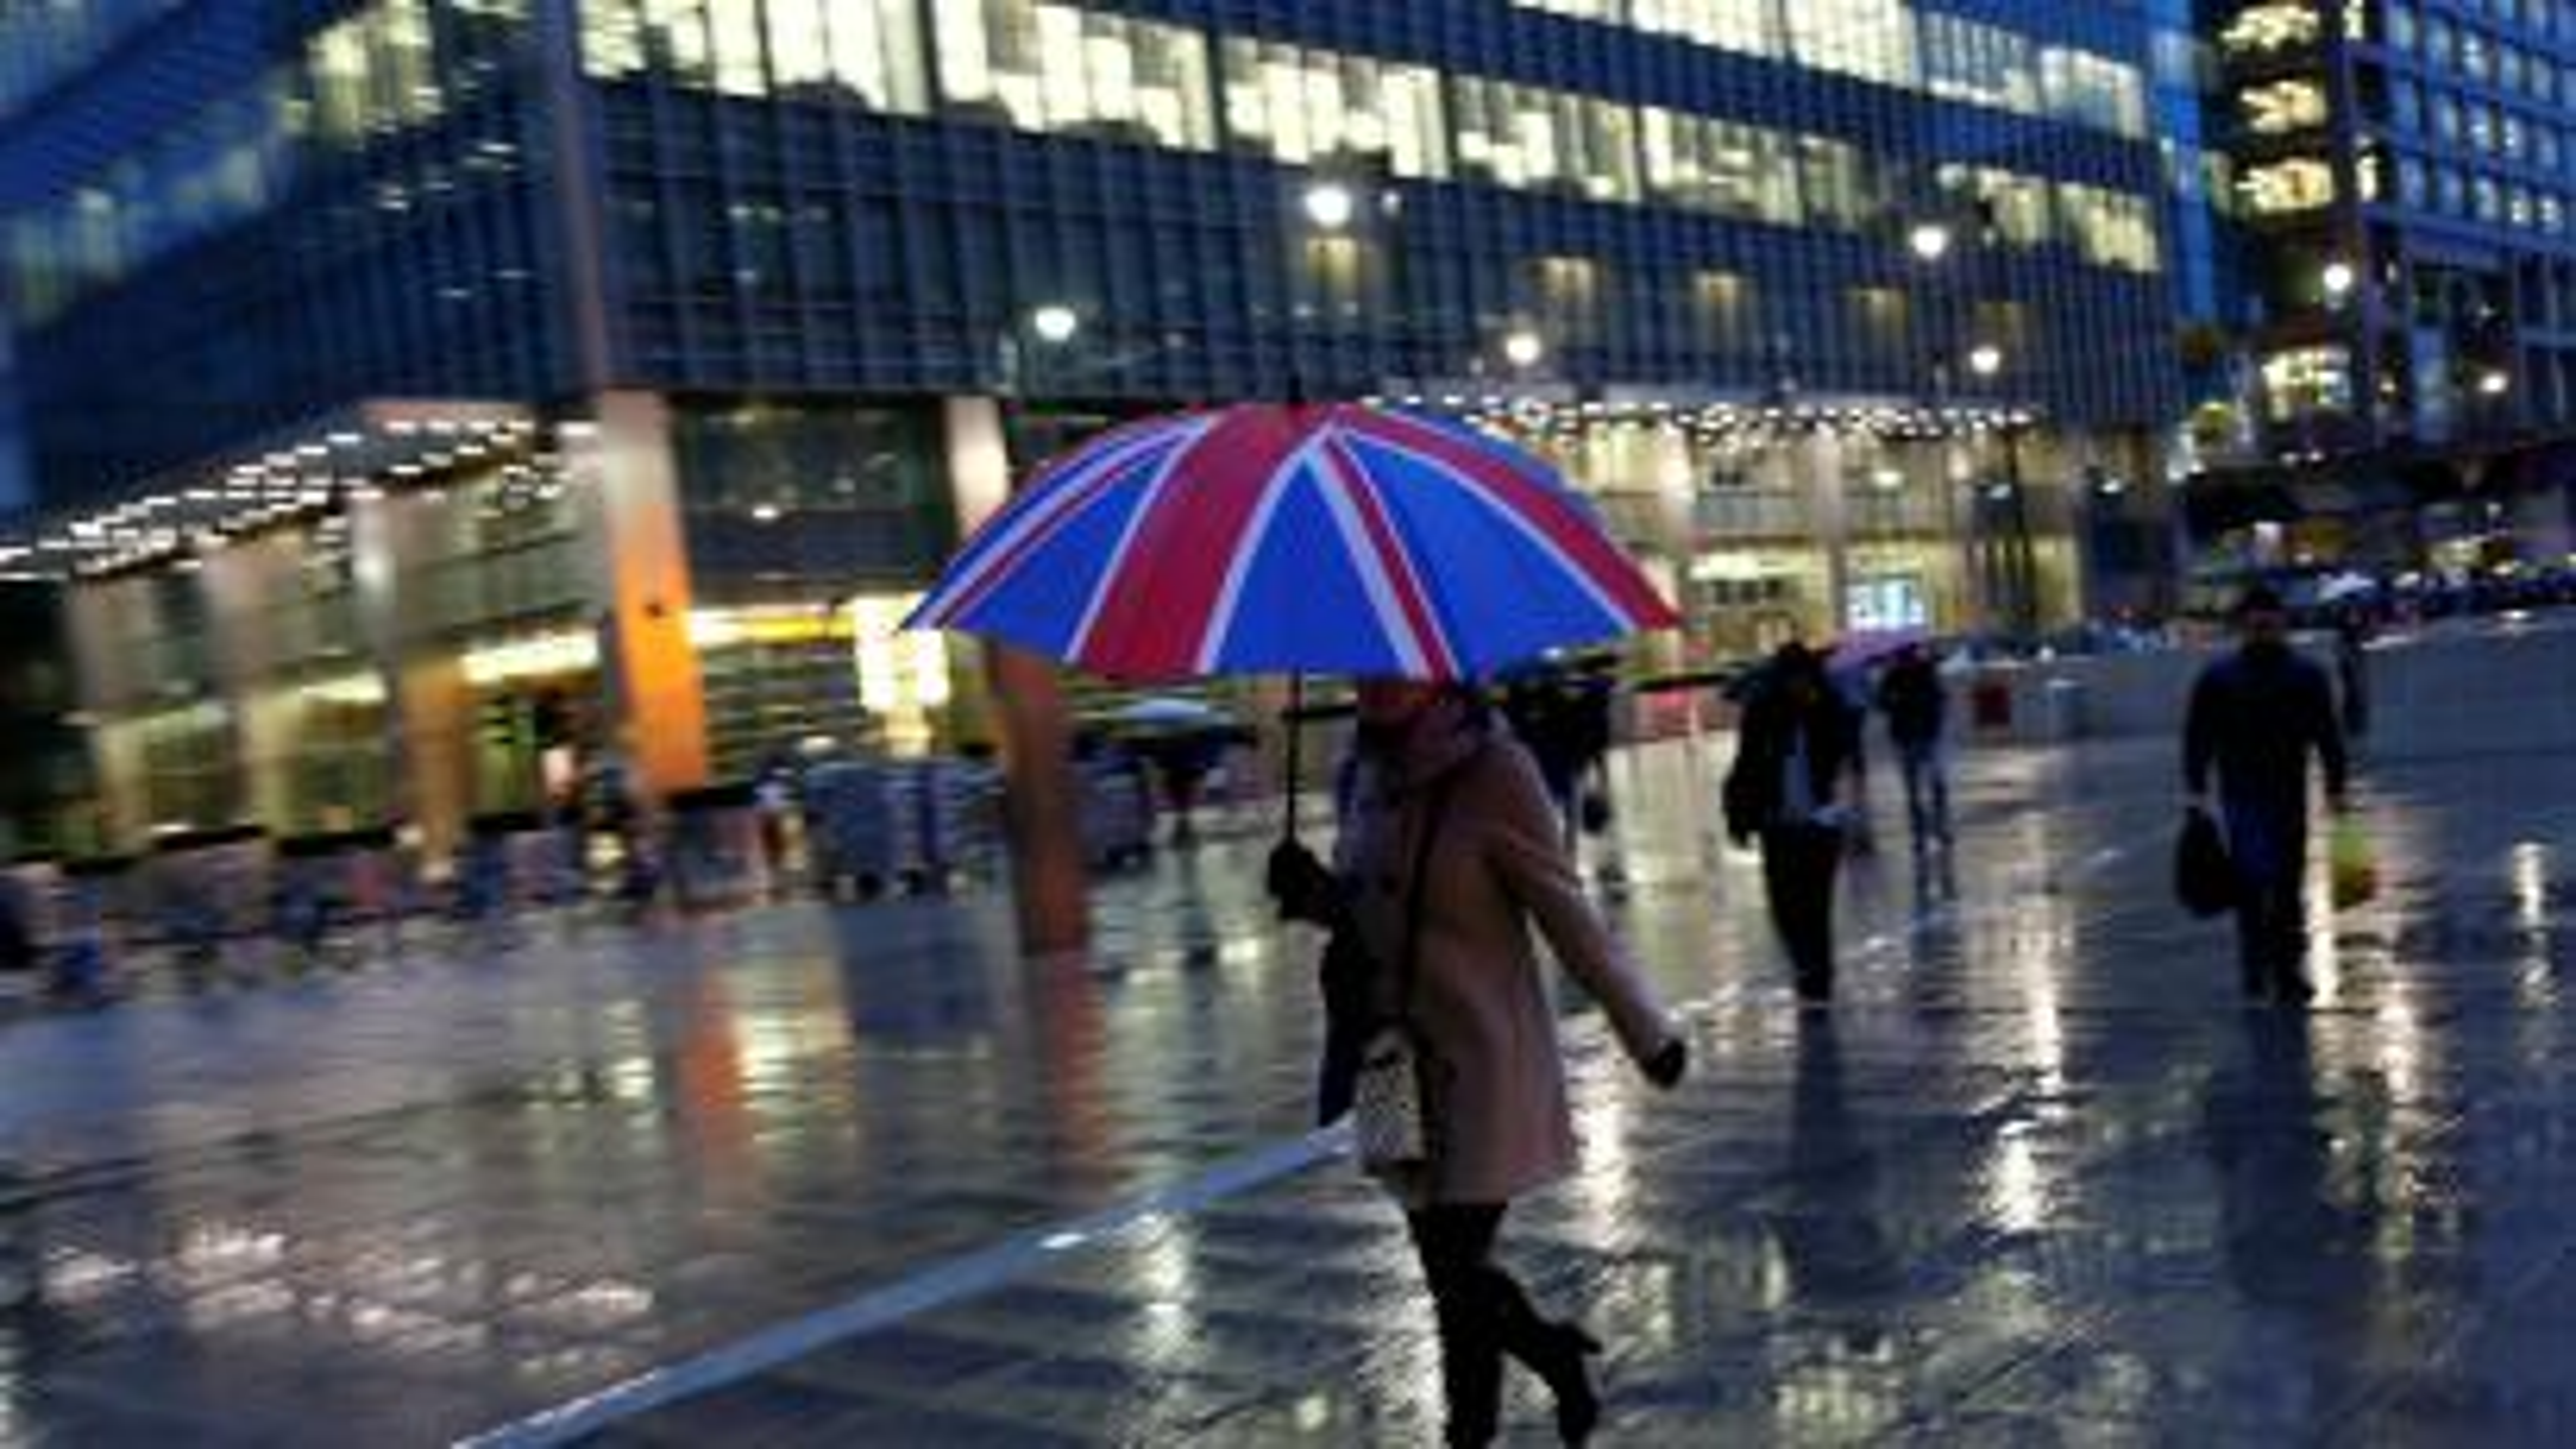 Union jack umbrella in the rain in Canary Wharf, London